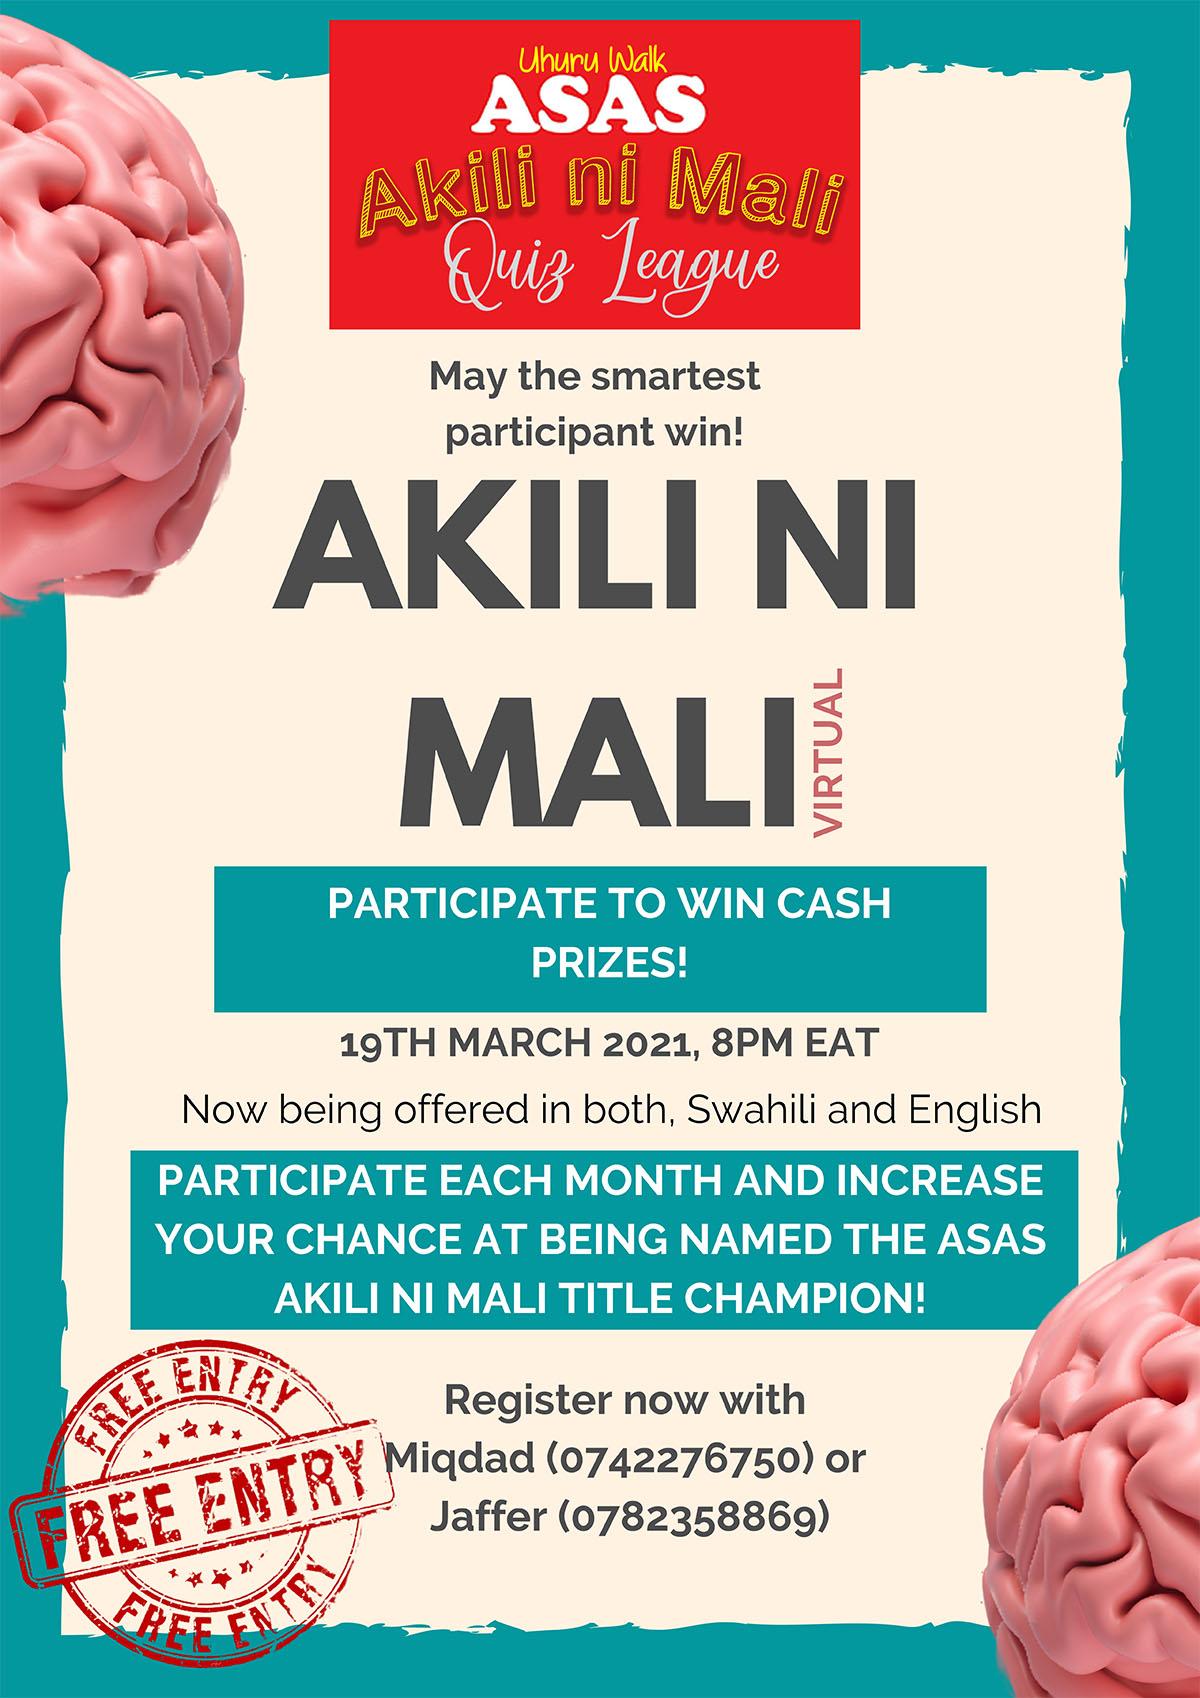 Asas-Uhuru Walk Akili ni Mali Quiz League